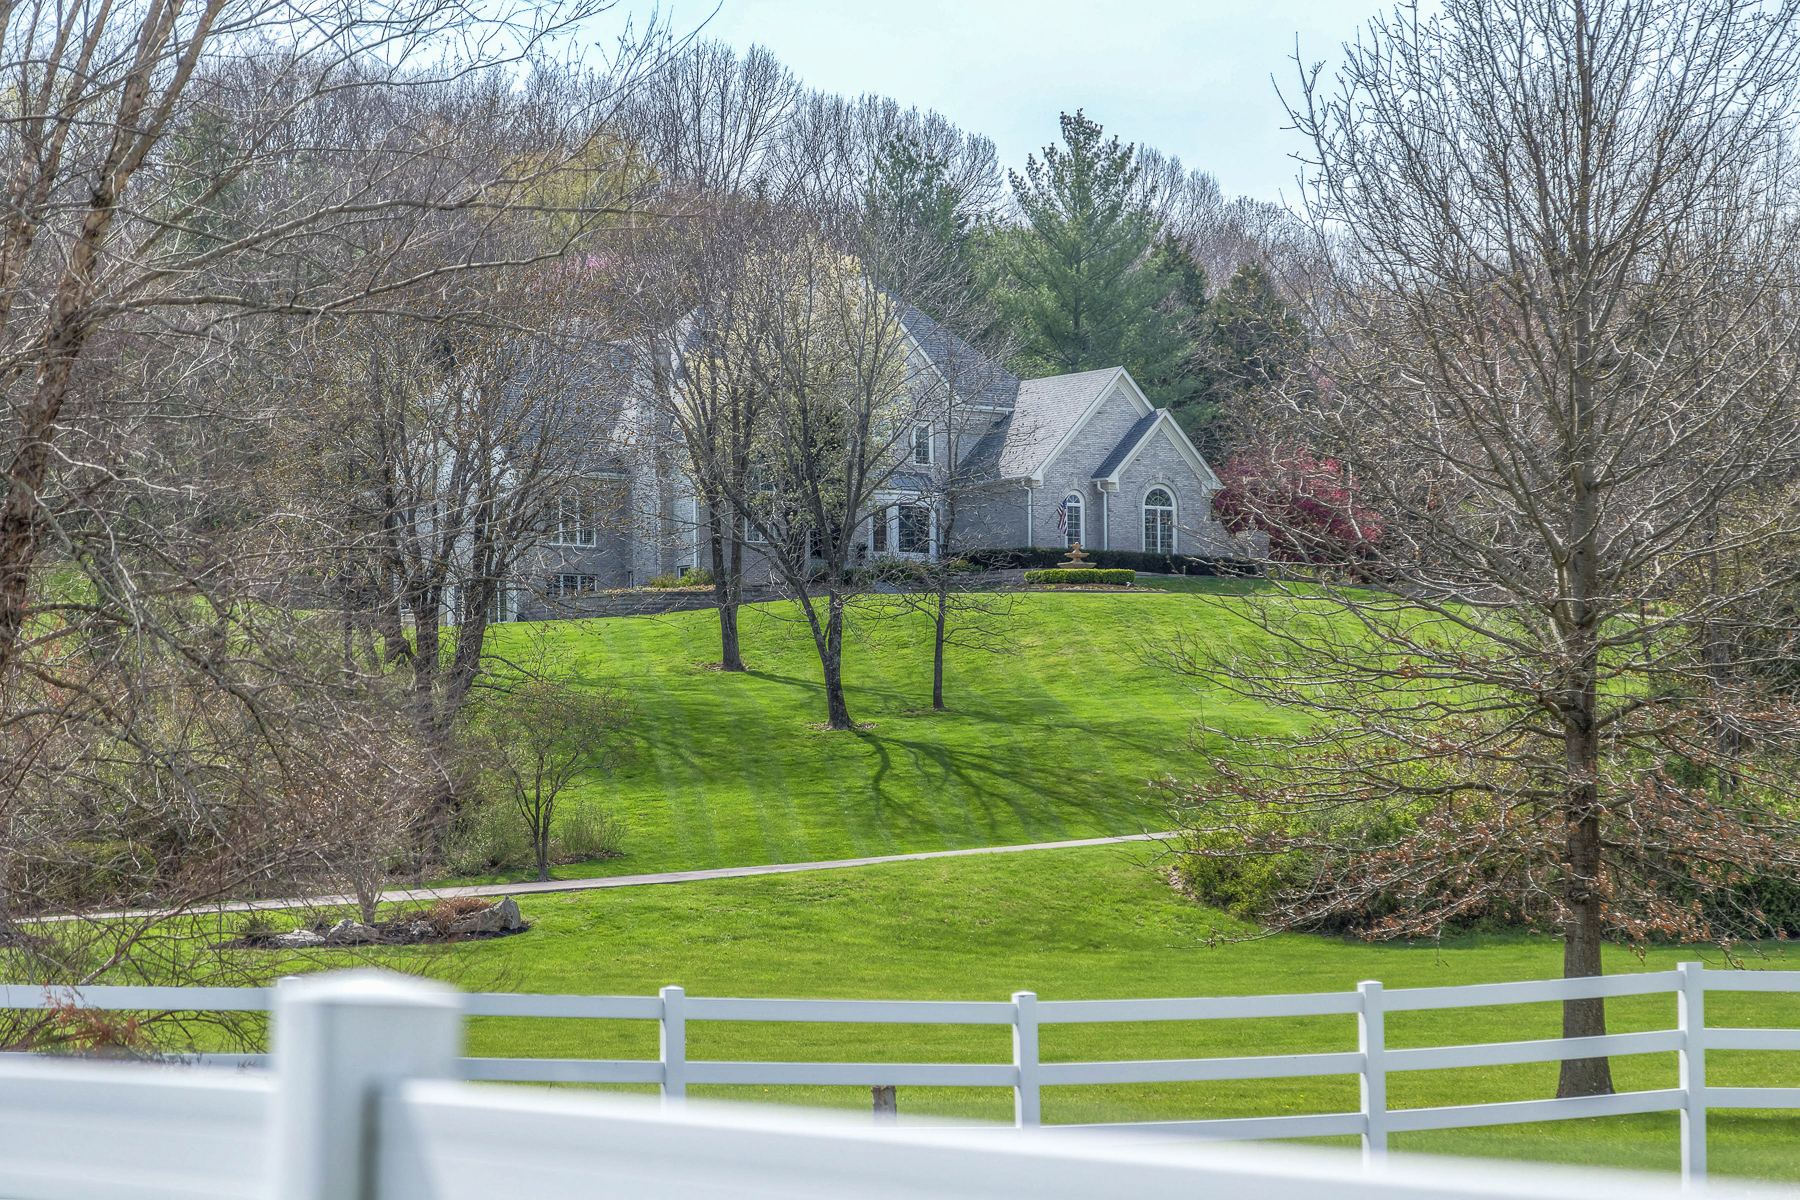 Single Family Home for Sale at Derr Pointe Estates 19300 Deer Pointe Estates Drive Wildwood, Missouri 63038 United States